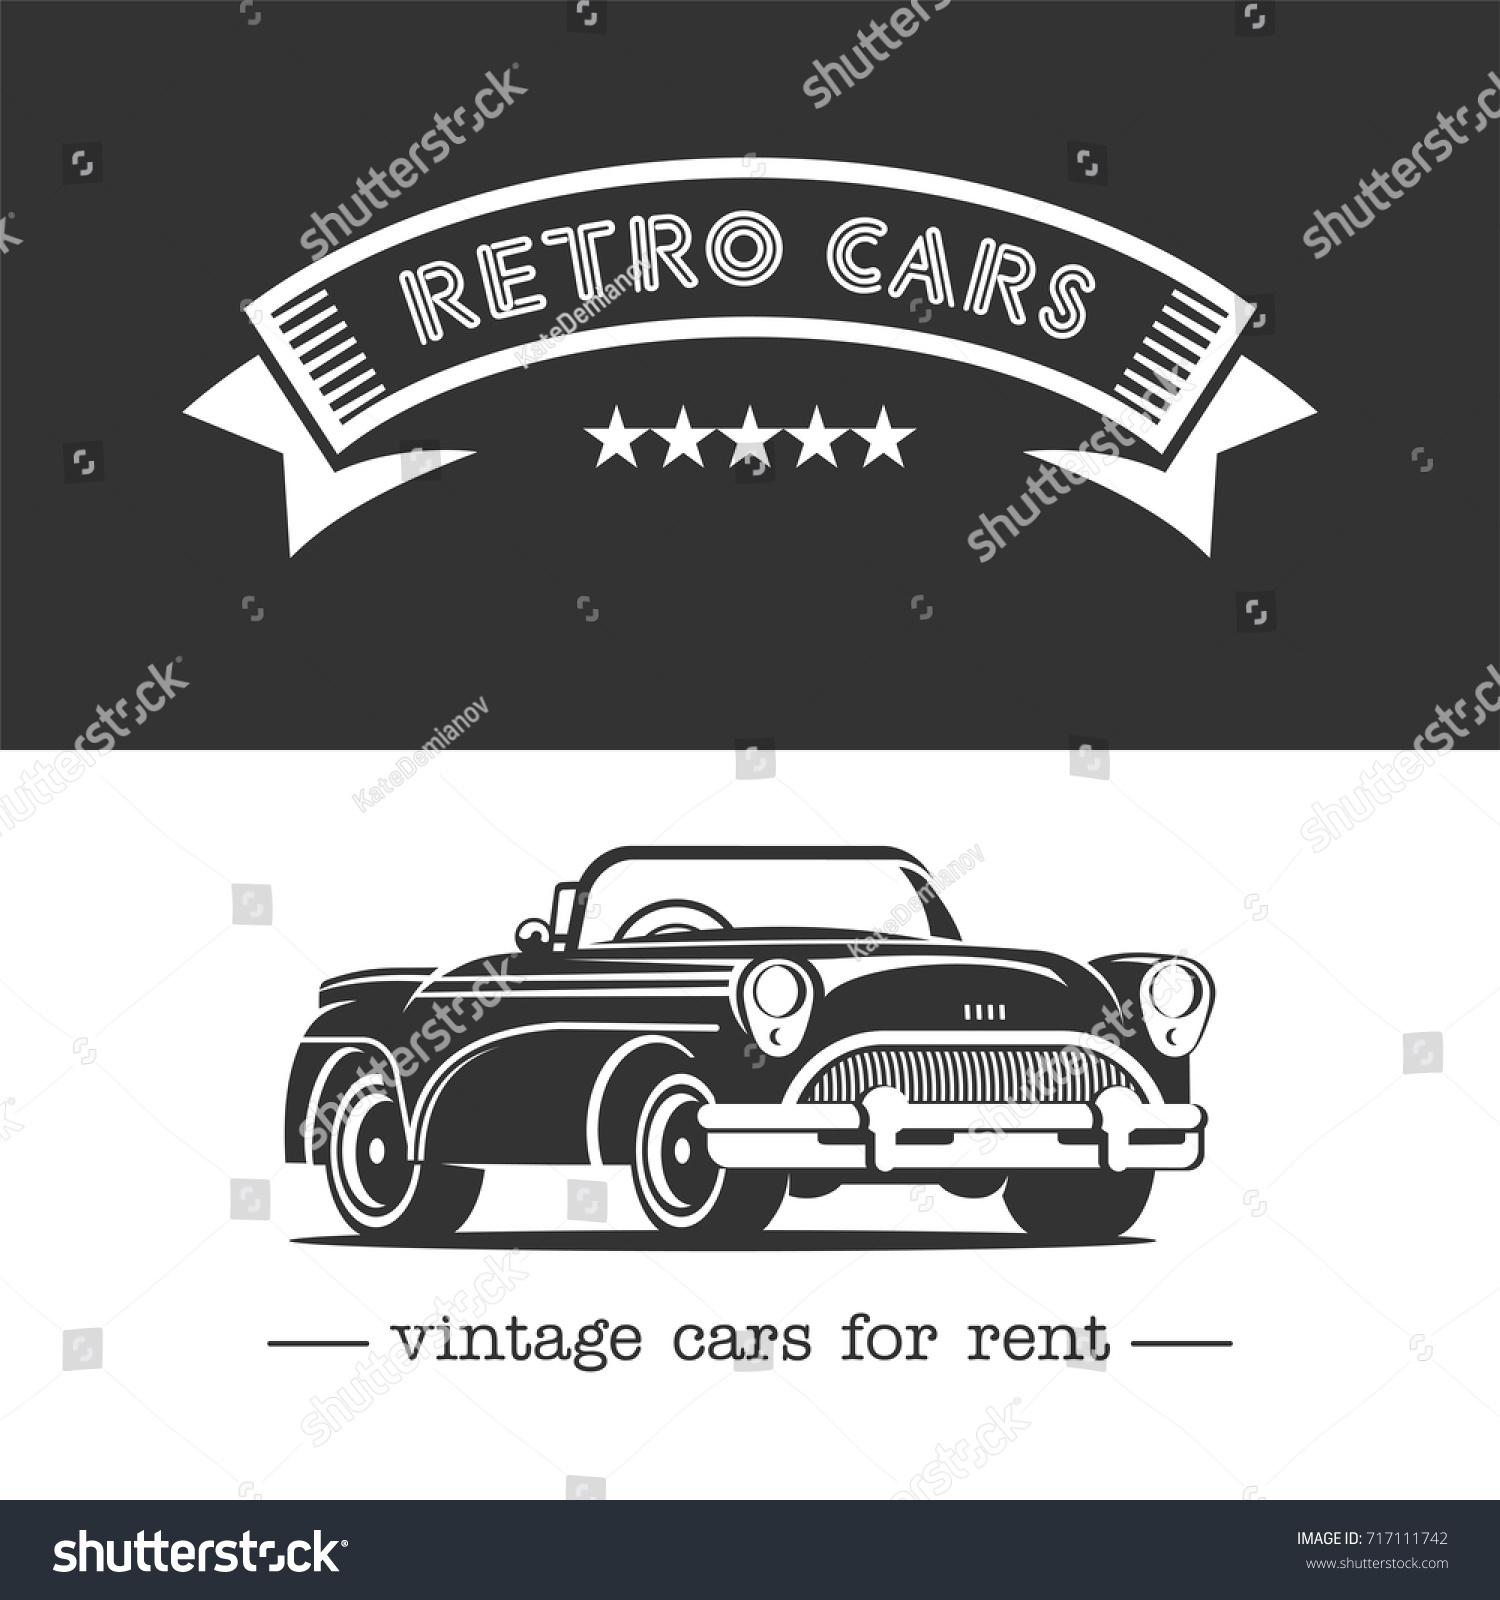 Vintage Car Monochrome Vector Logo Retro Stock Vector HD (Royalty ...